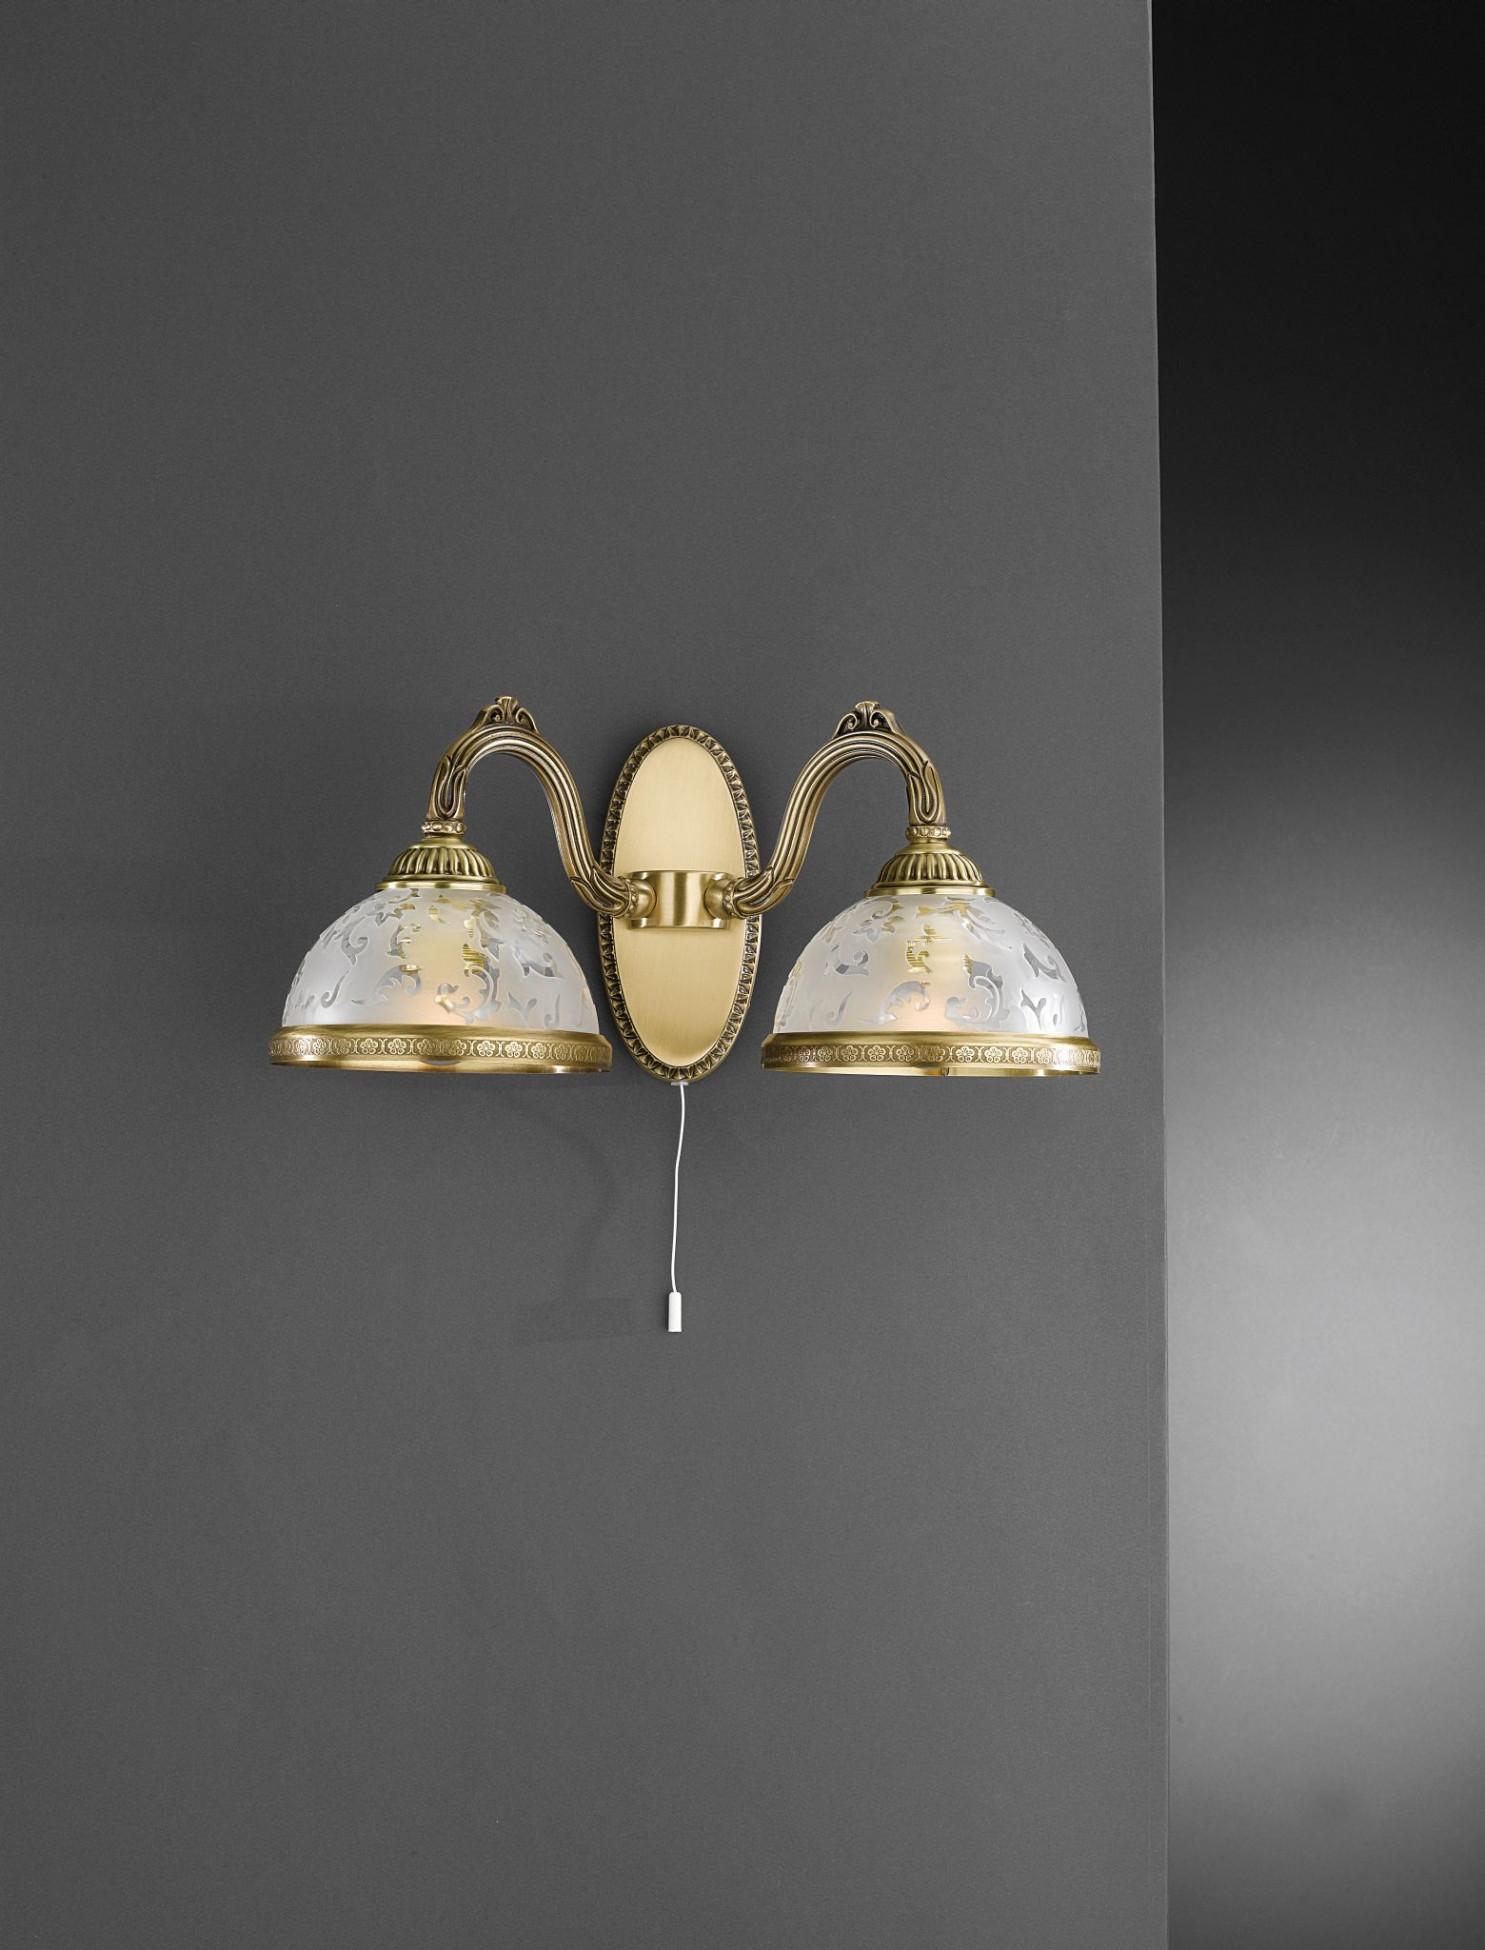 wandlampe aus messing mit milchglas 2 flammig reccagni store. Black Bedroom Furniture Sets. Home Design Ideas